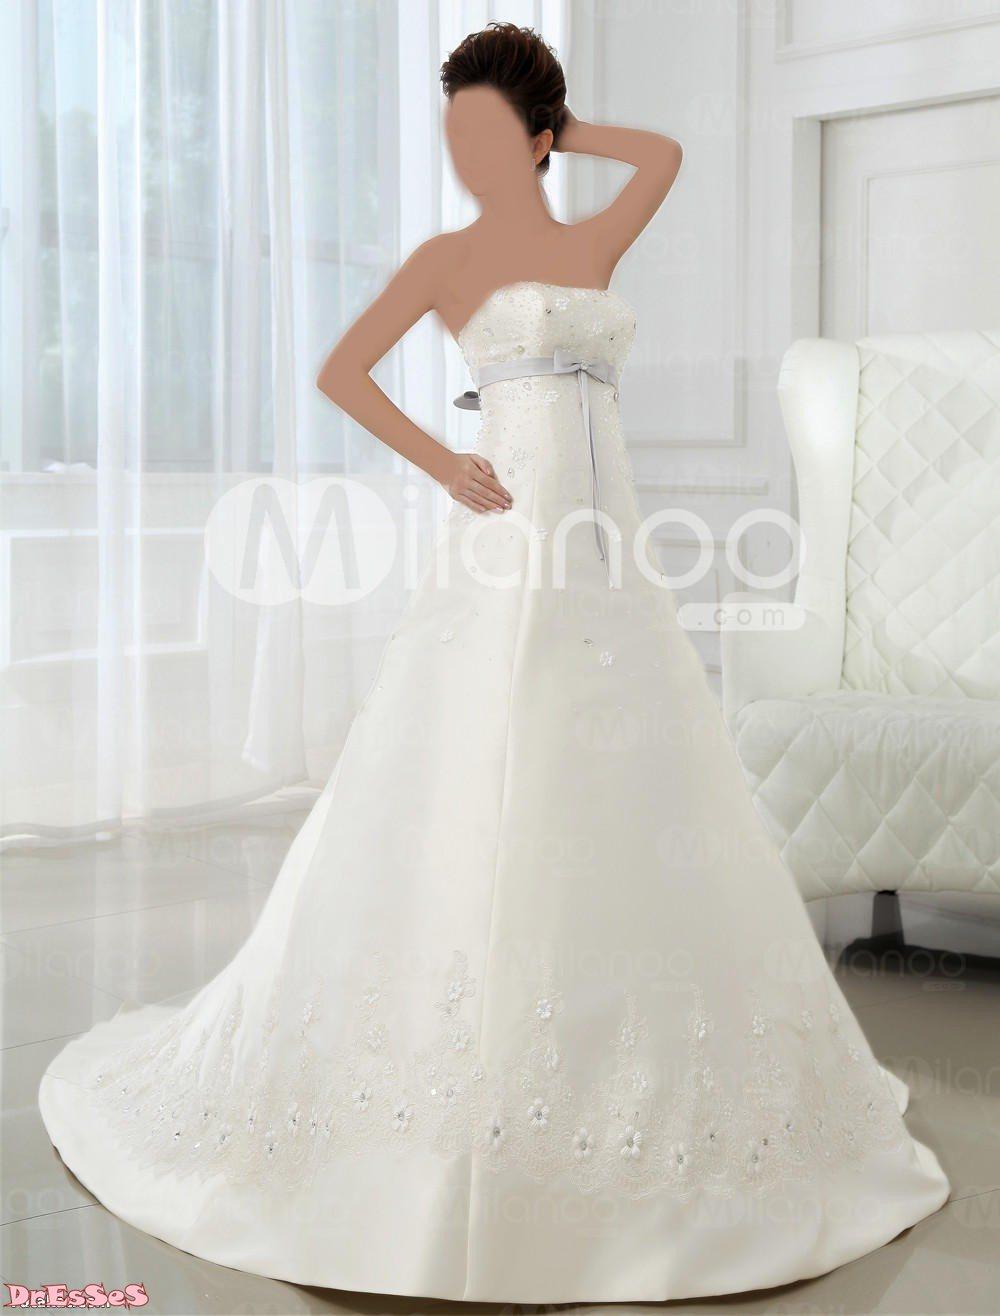 خطوووووووووووووبه و زفاف